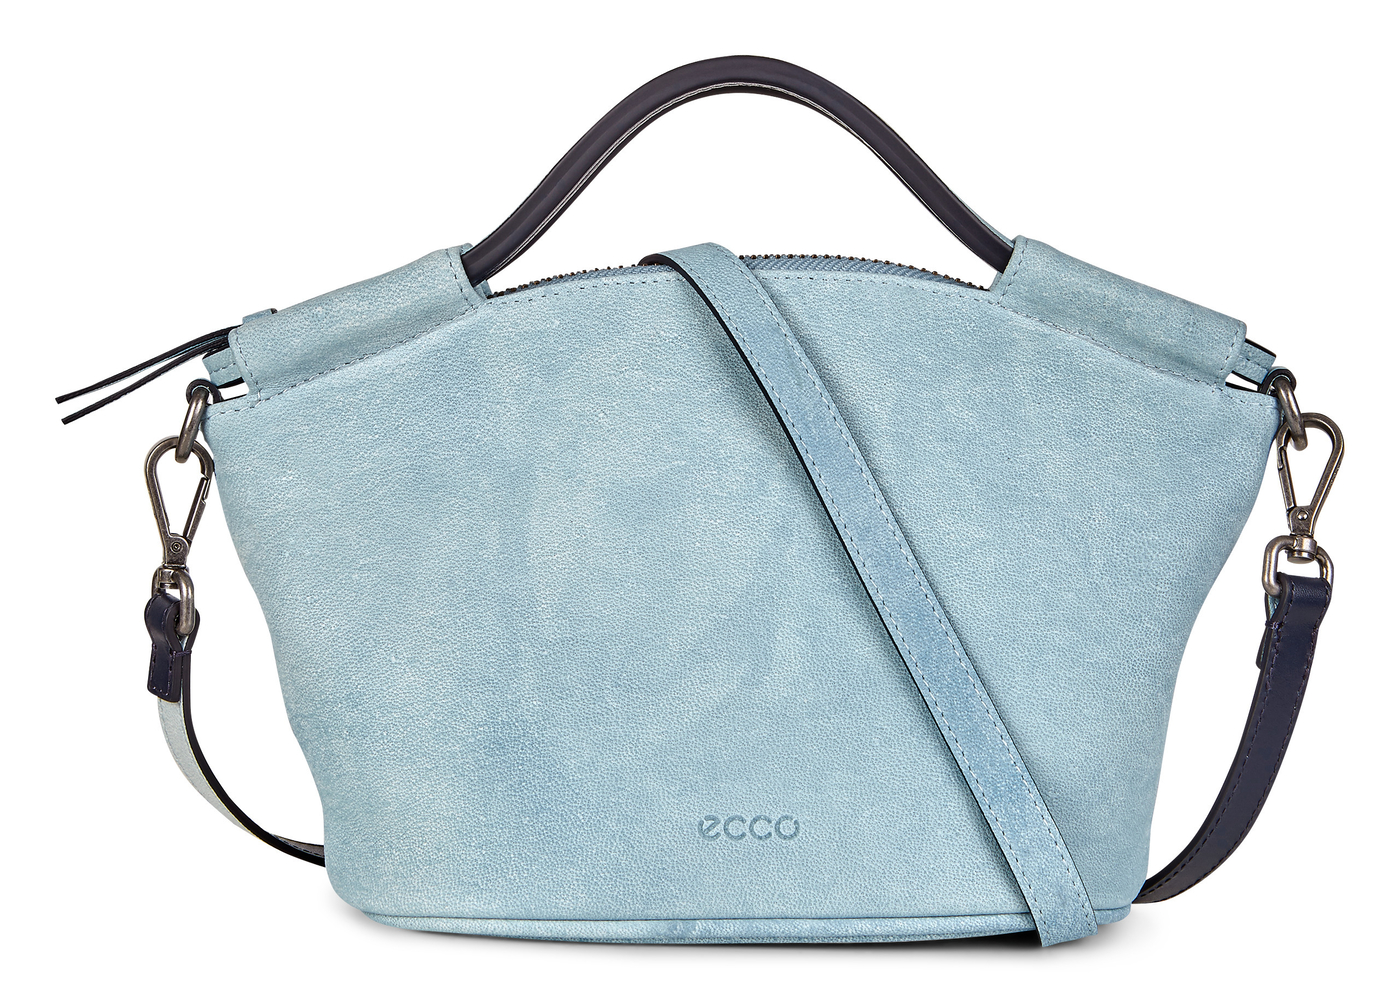 ECCO SP2 Small Doctors Bag Indigo